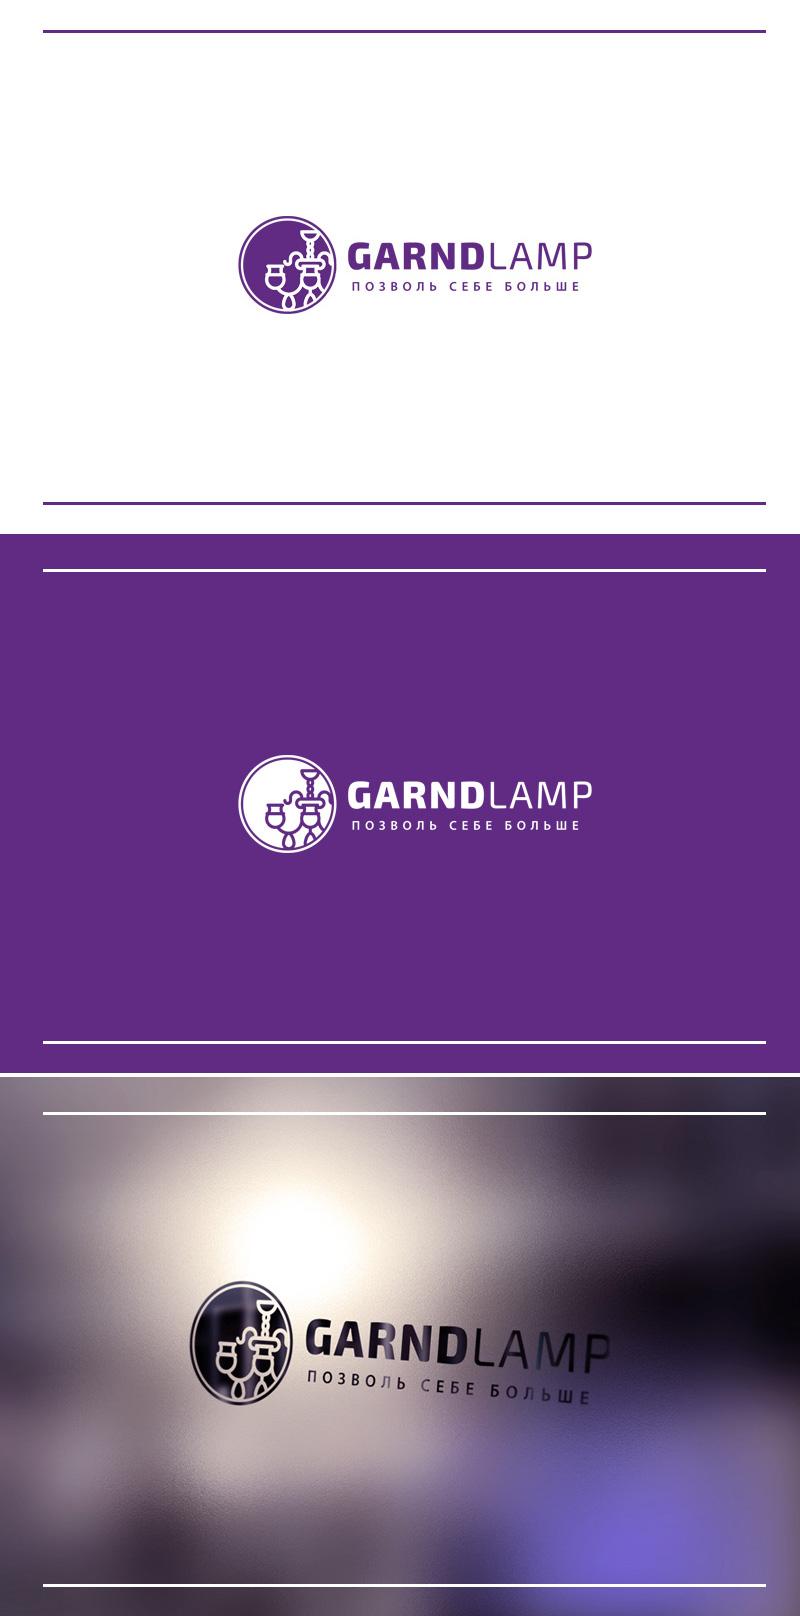 Разработка логотипа и элементов фирменного стиля фото f_62257f3d38df0604.jpg